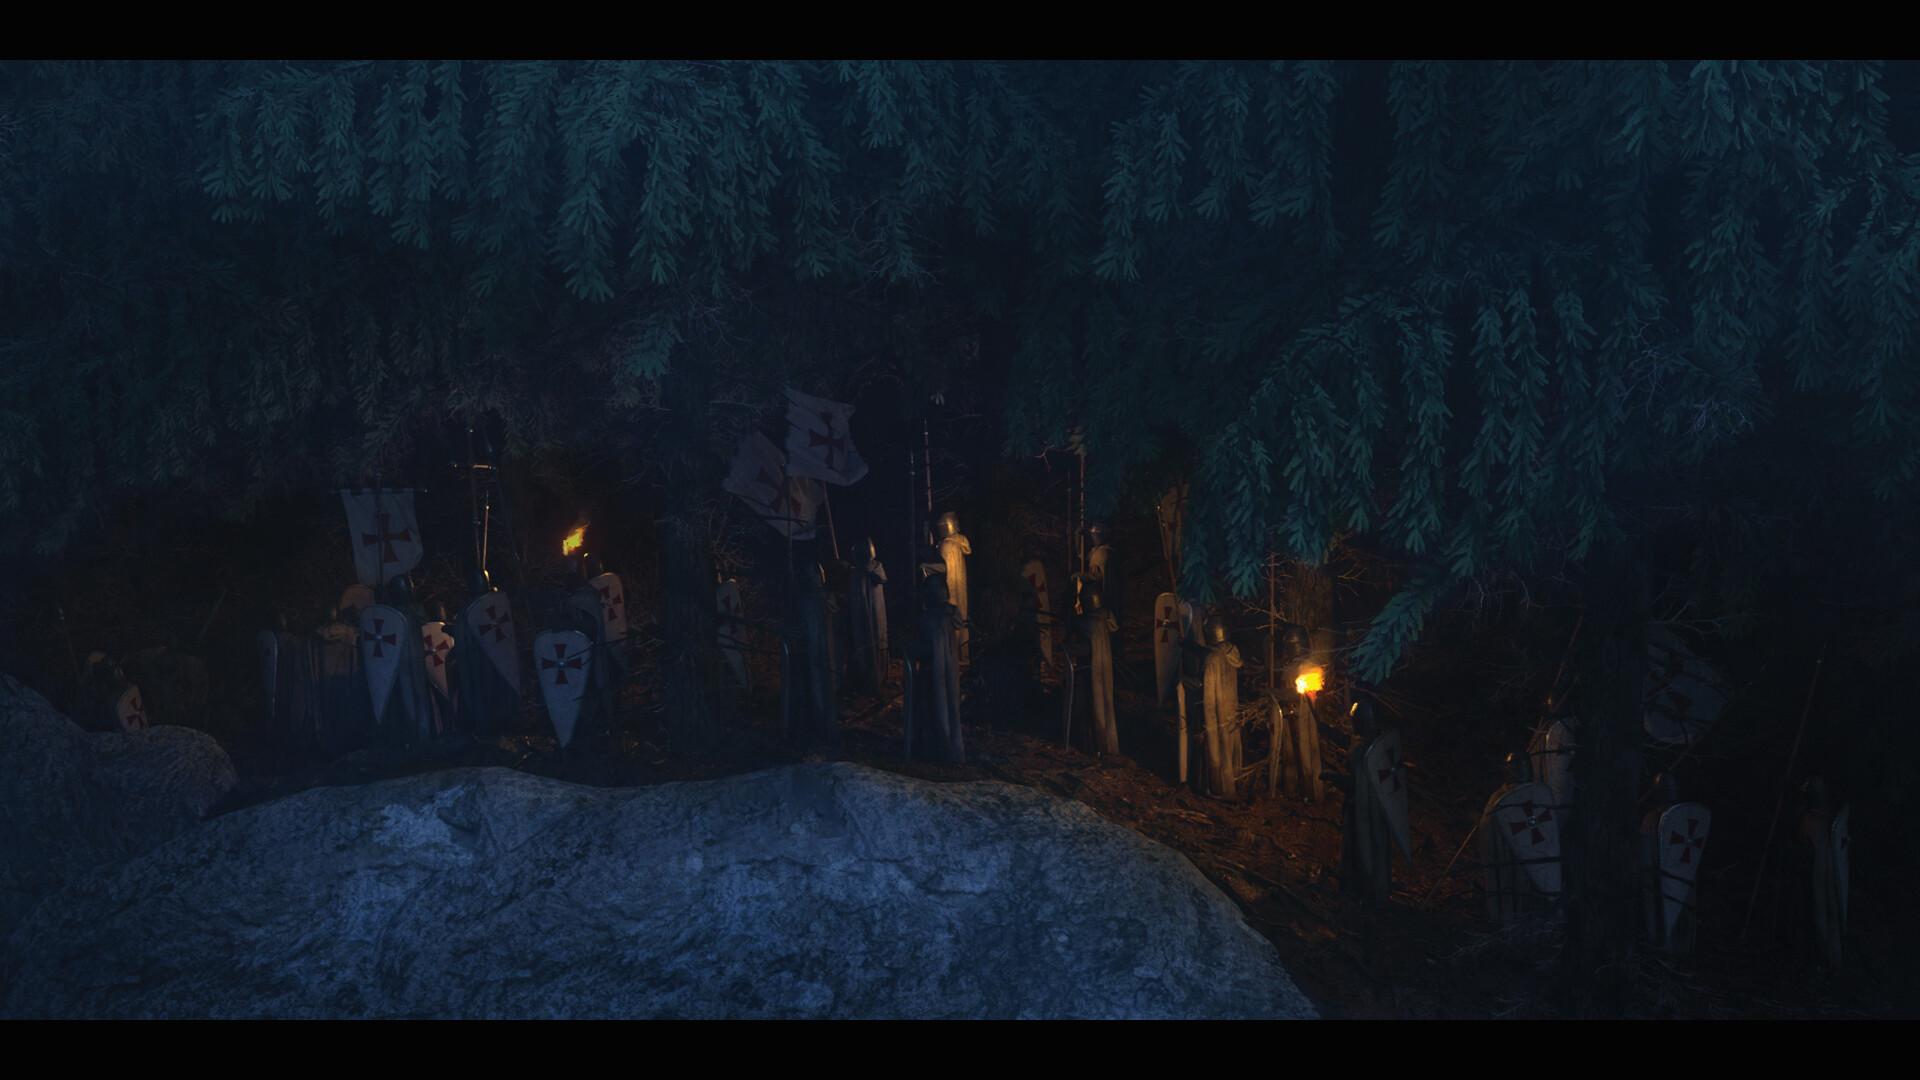 Wojtek kapusta templars forest 06